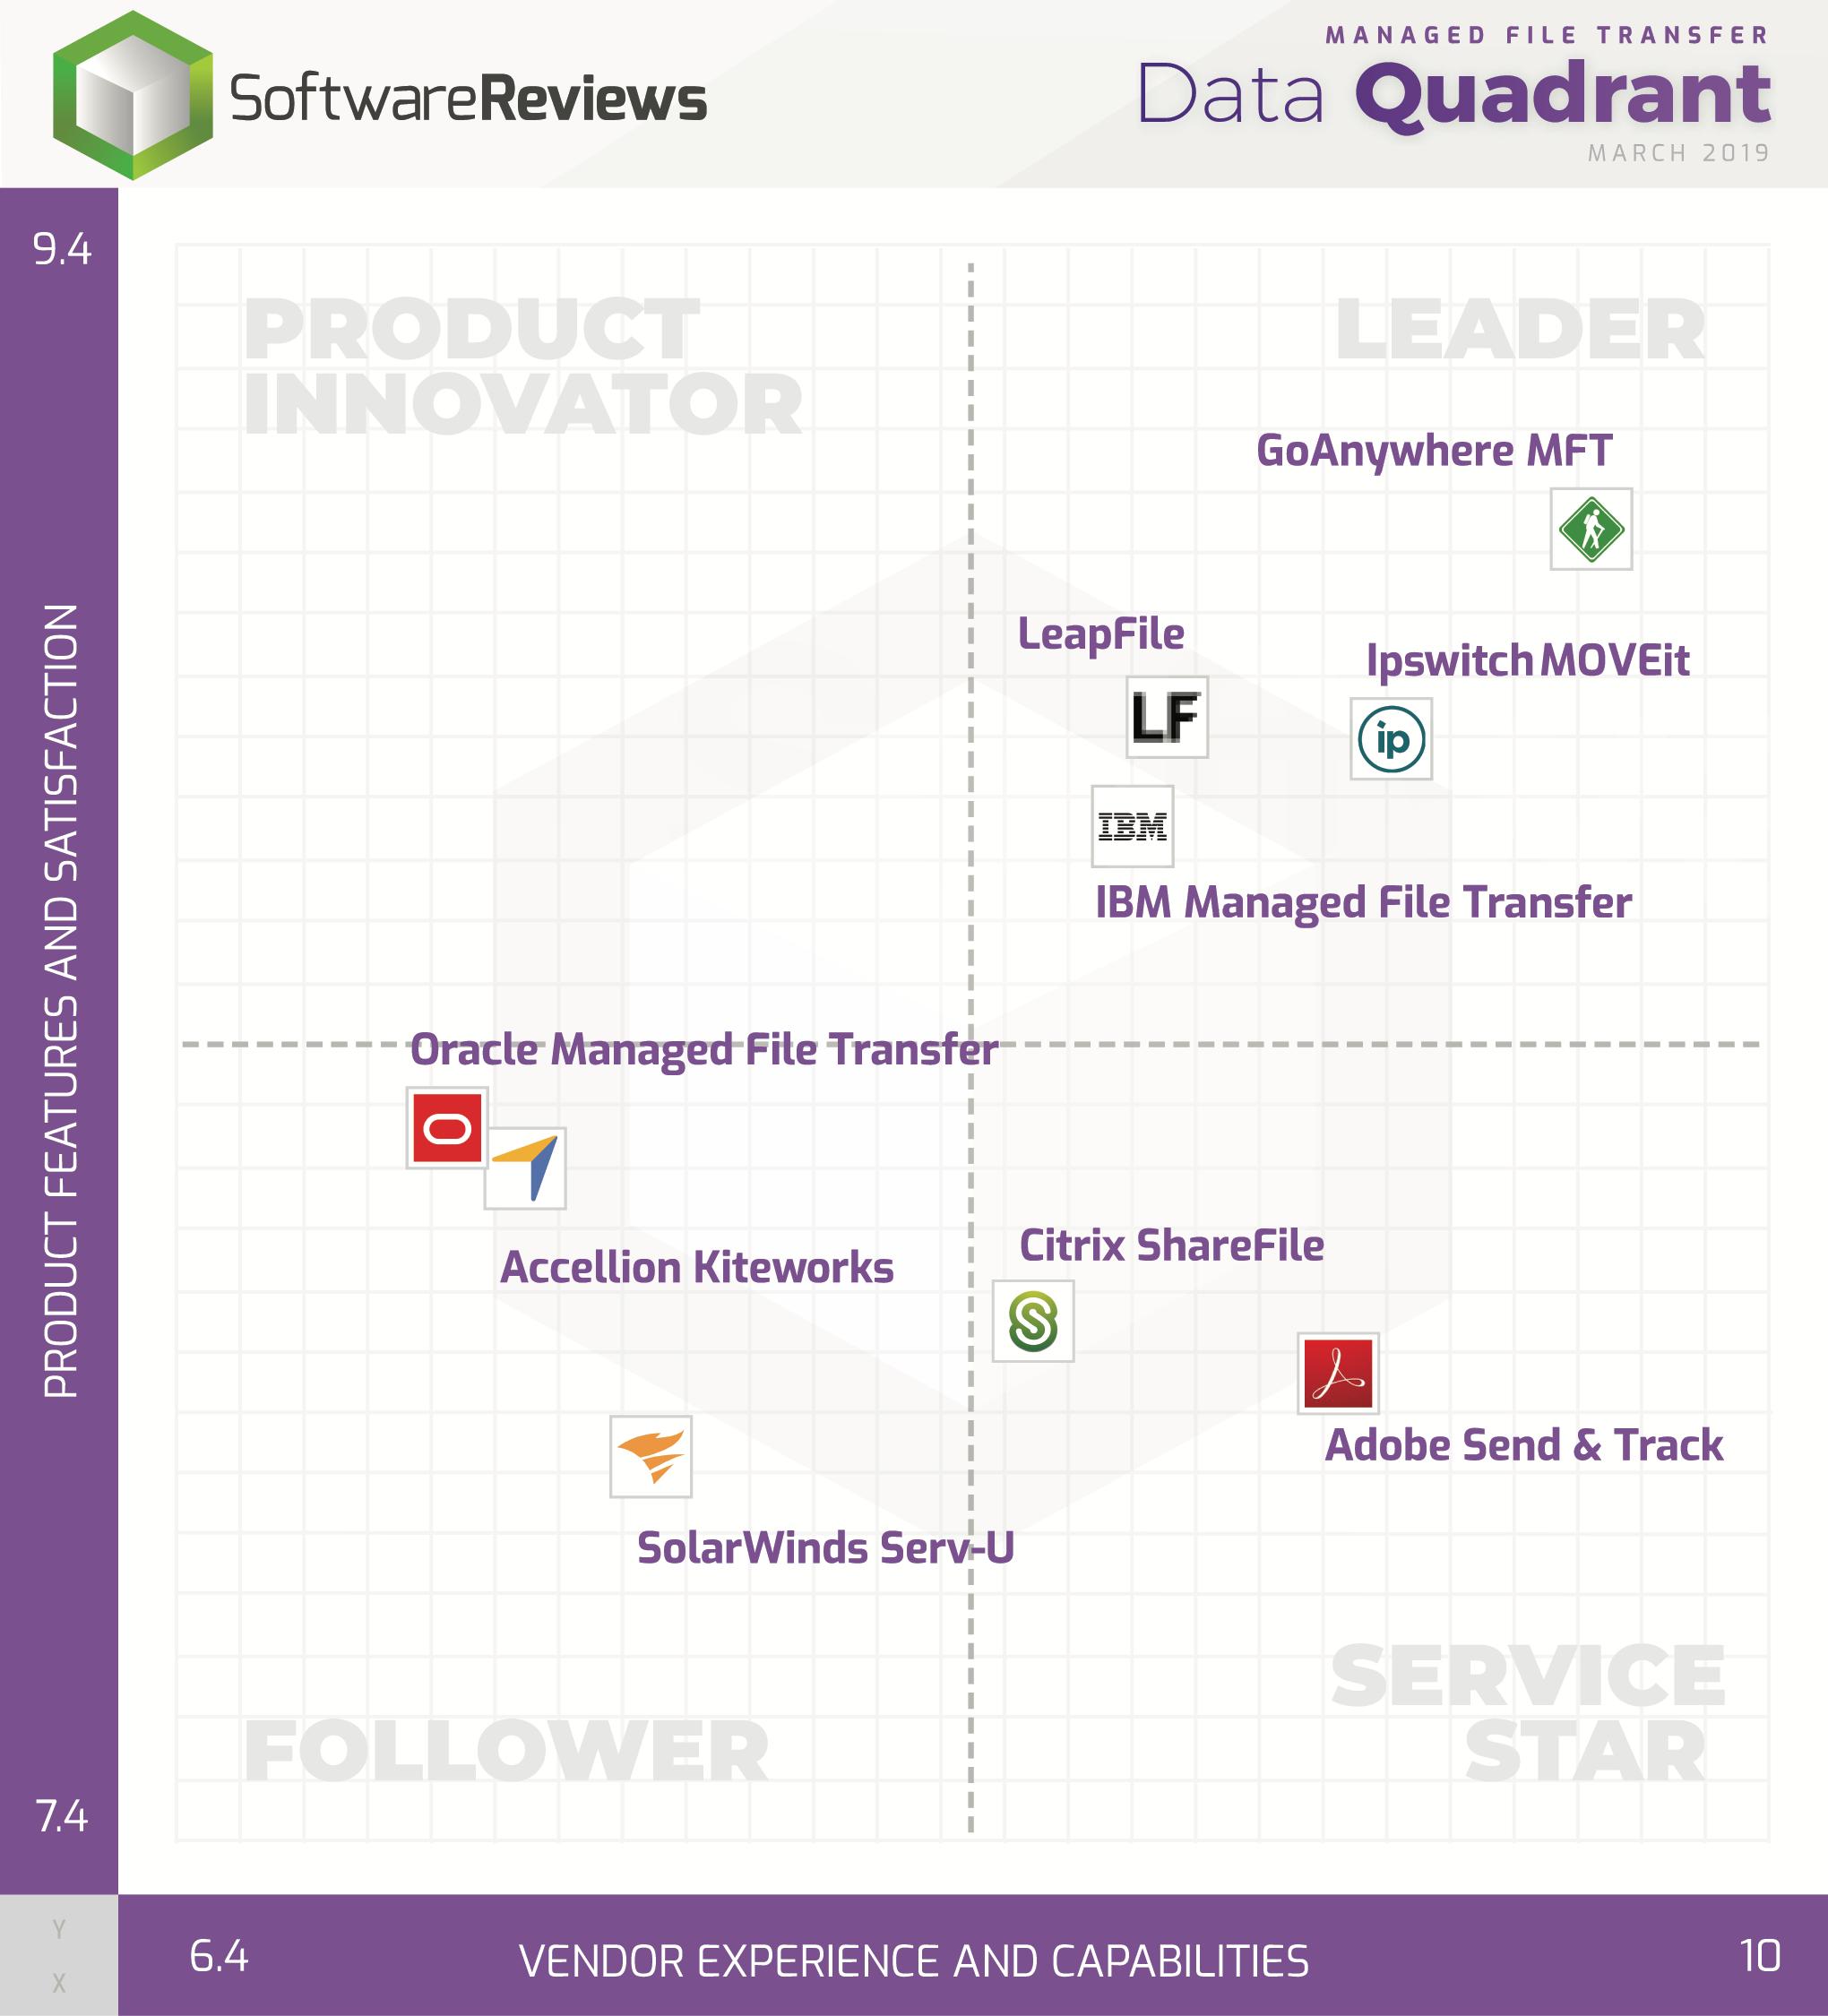 Managed File Transfer Data Quadrant